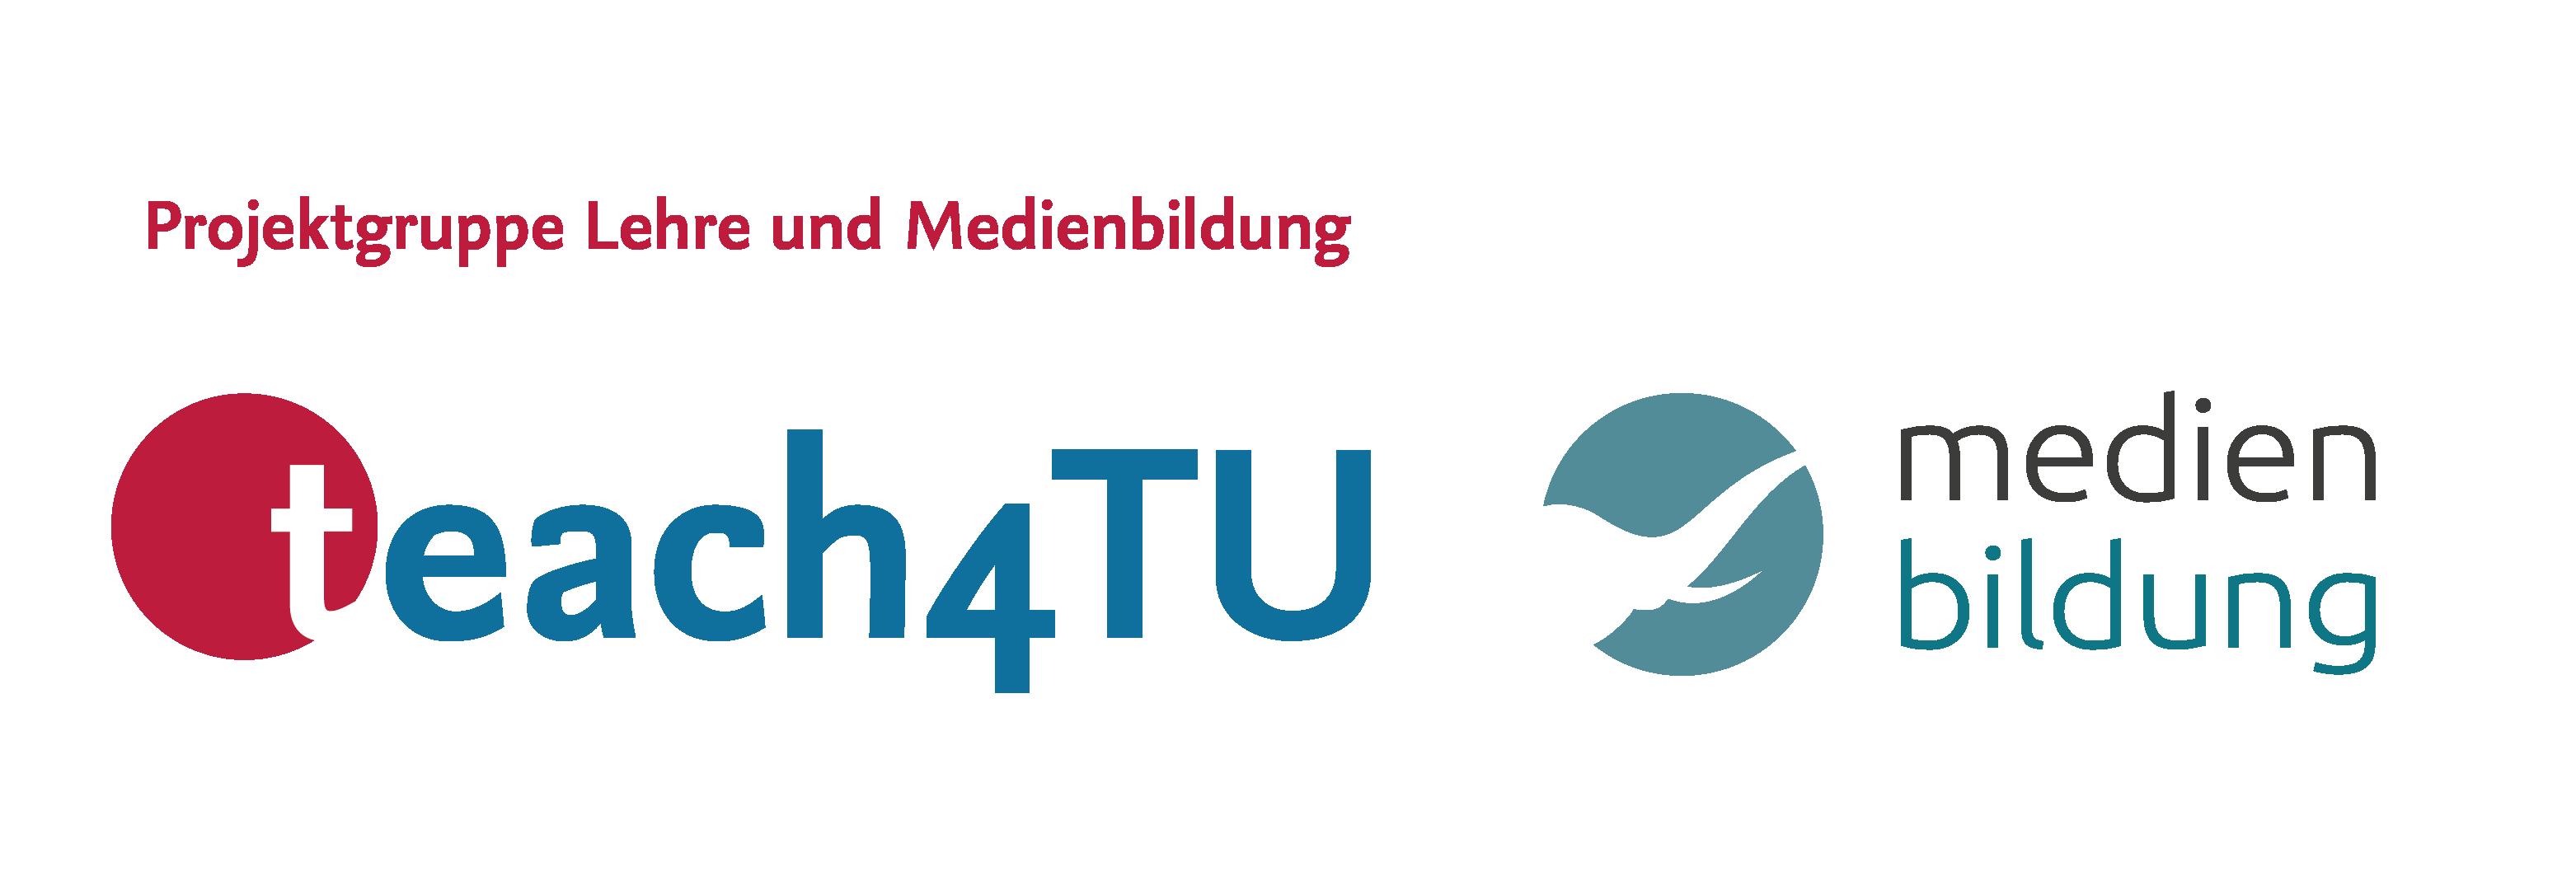 2017-03-22_58d286fbc9c46_Logokombinationen_TU-Magazin_2017-02-15_teach4TUMedienbildung.png